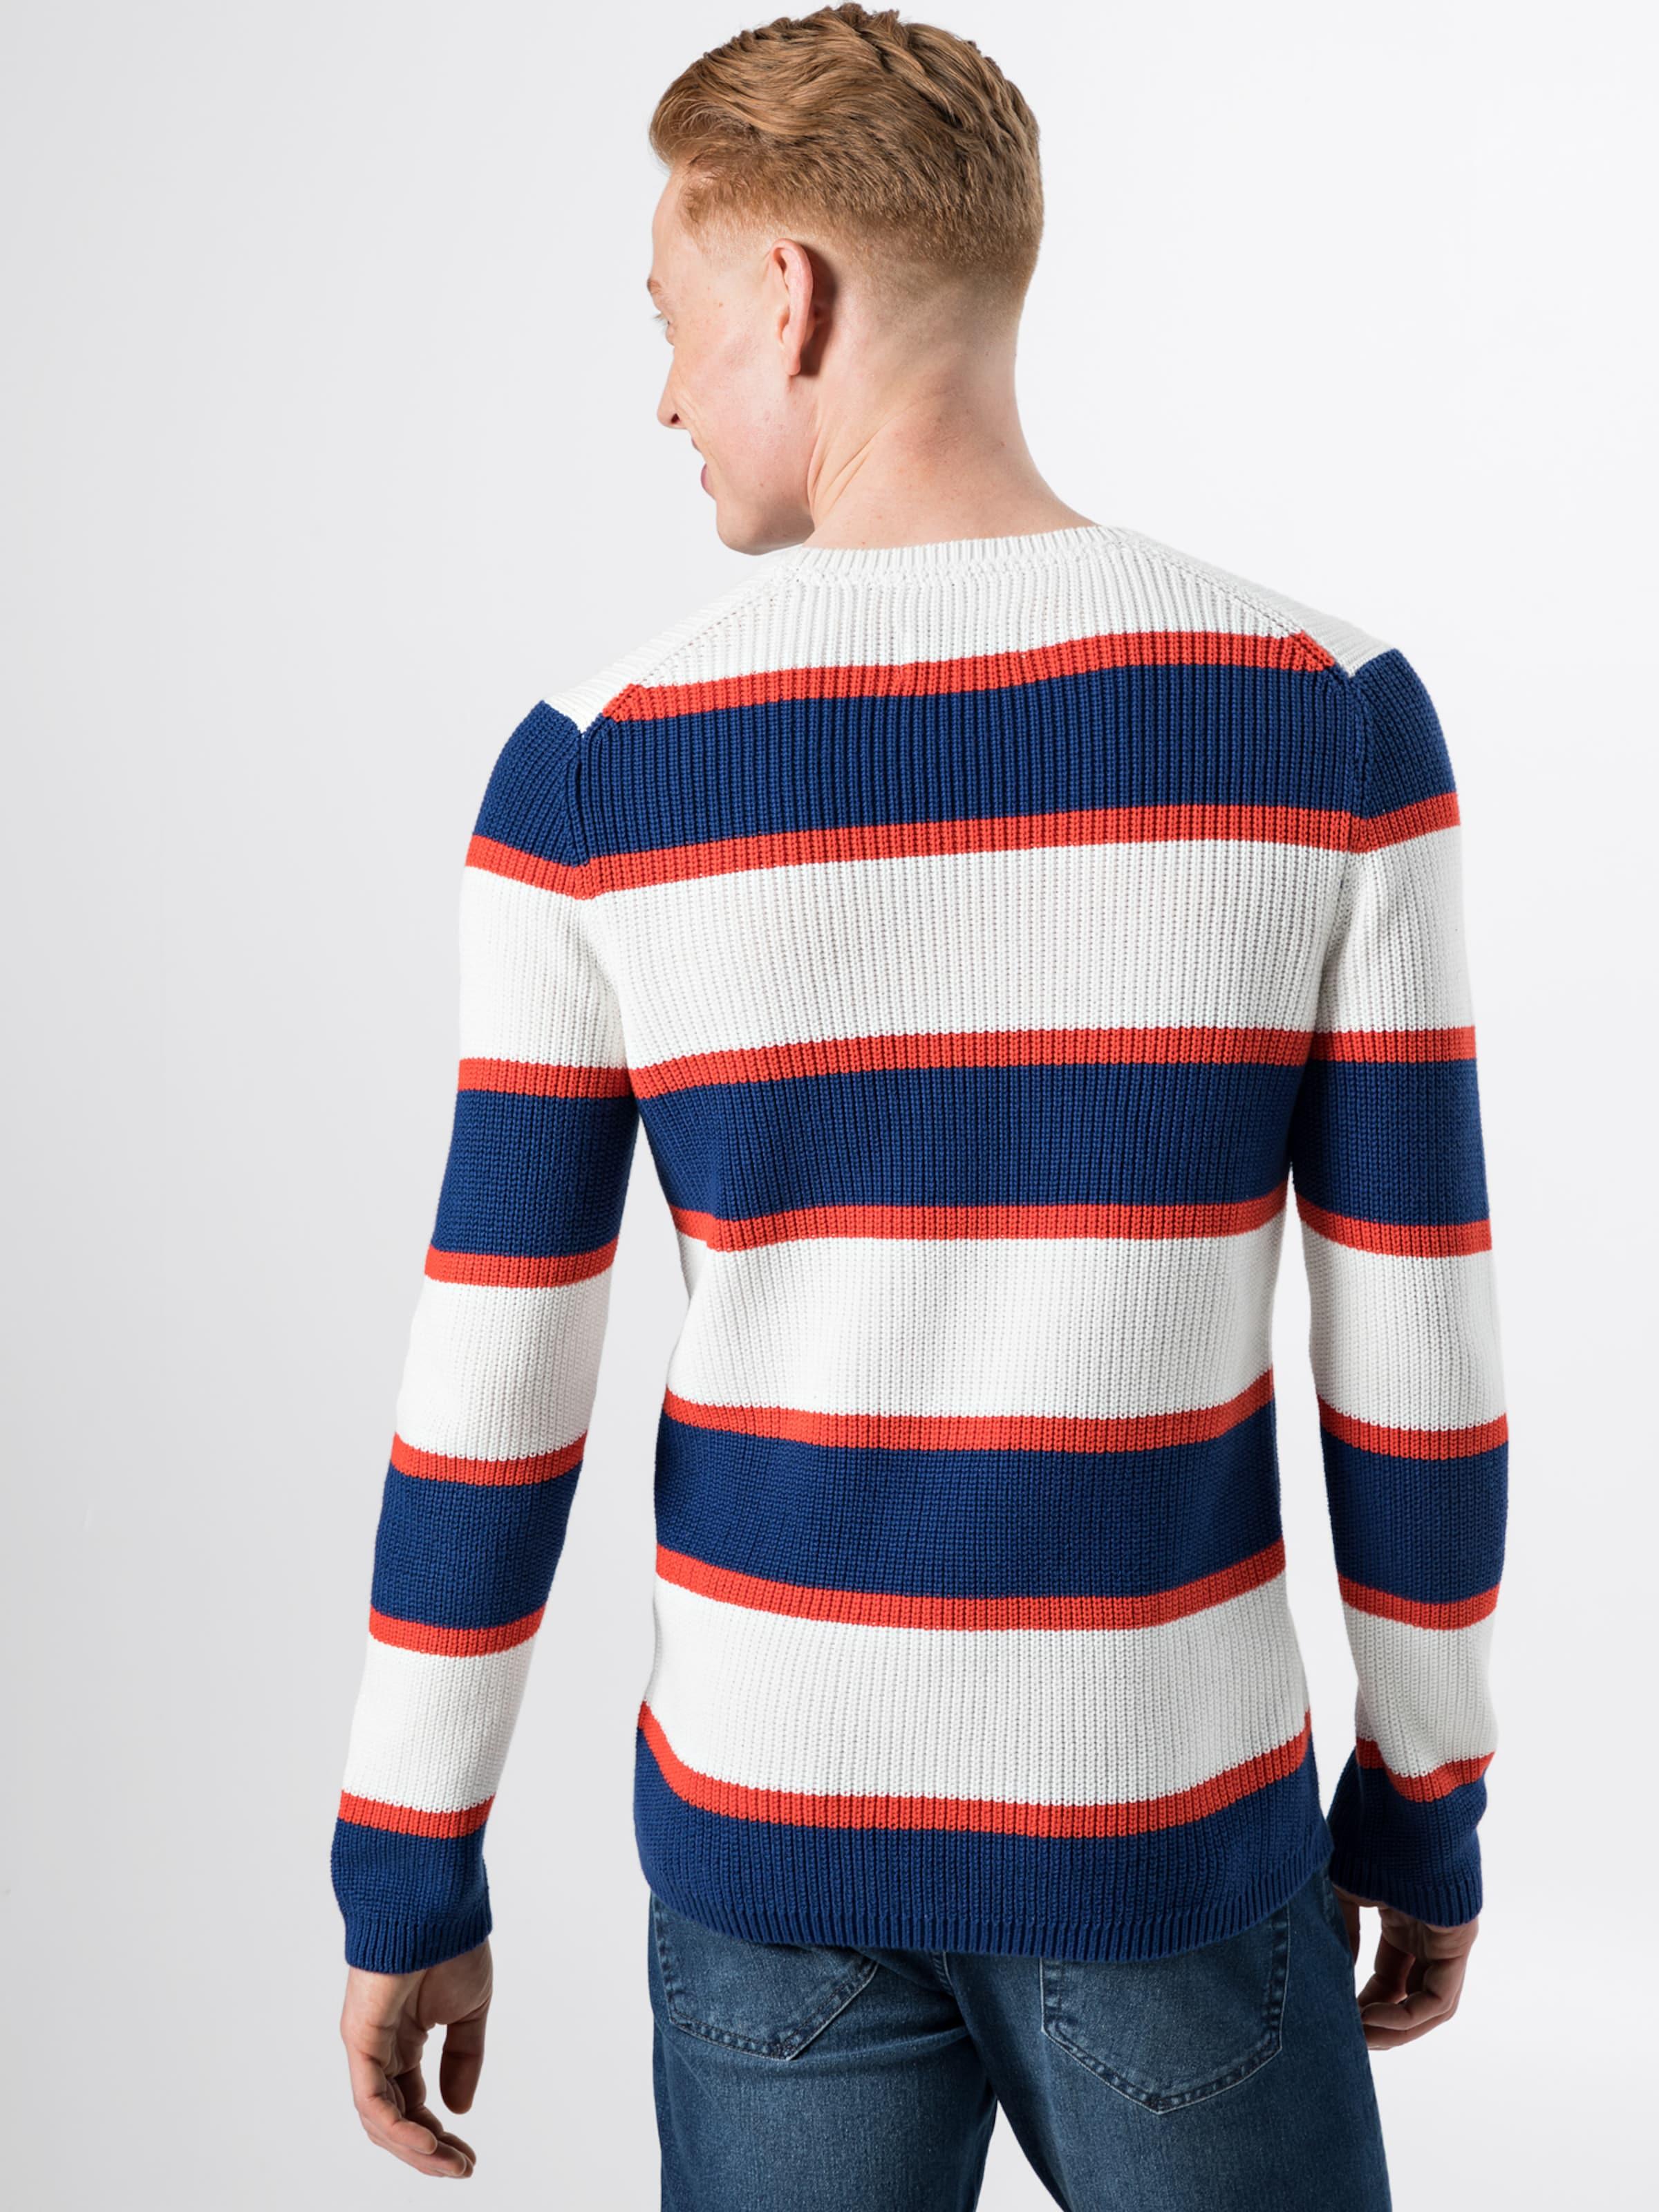 Denim Blanc Tailor Pull Tom Bleu En over FoncéRouge QrdBthxCso